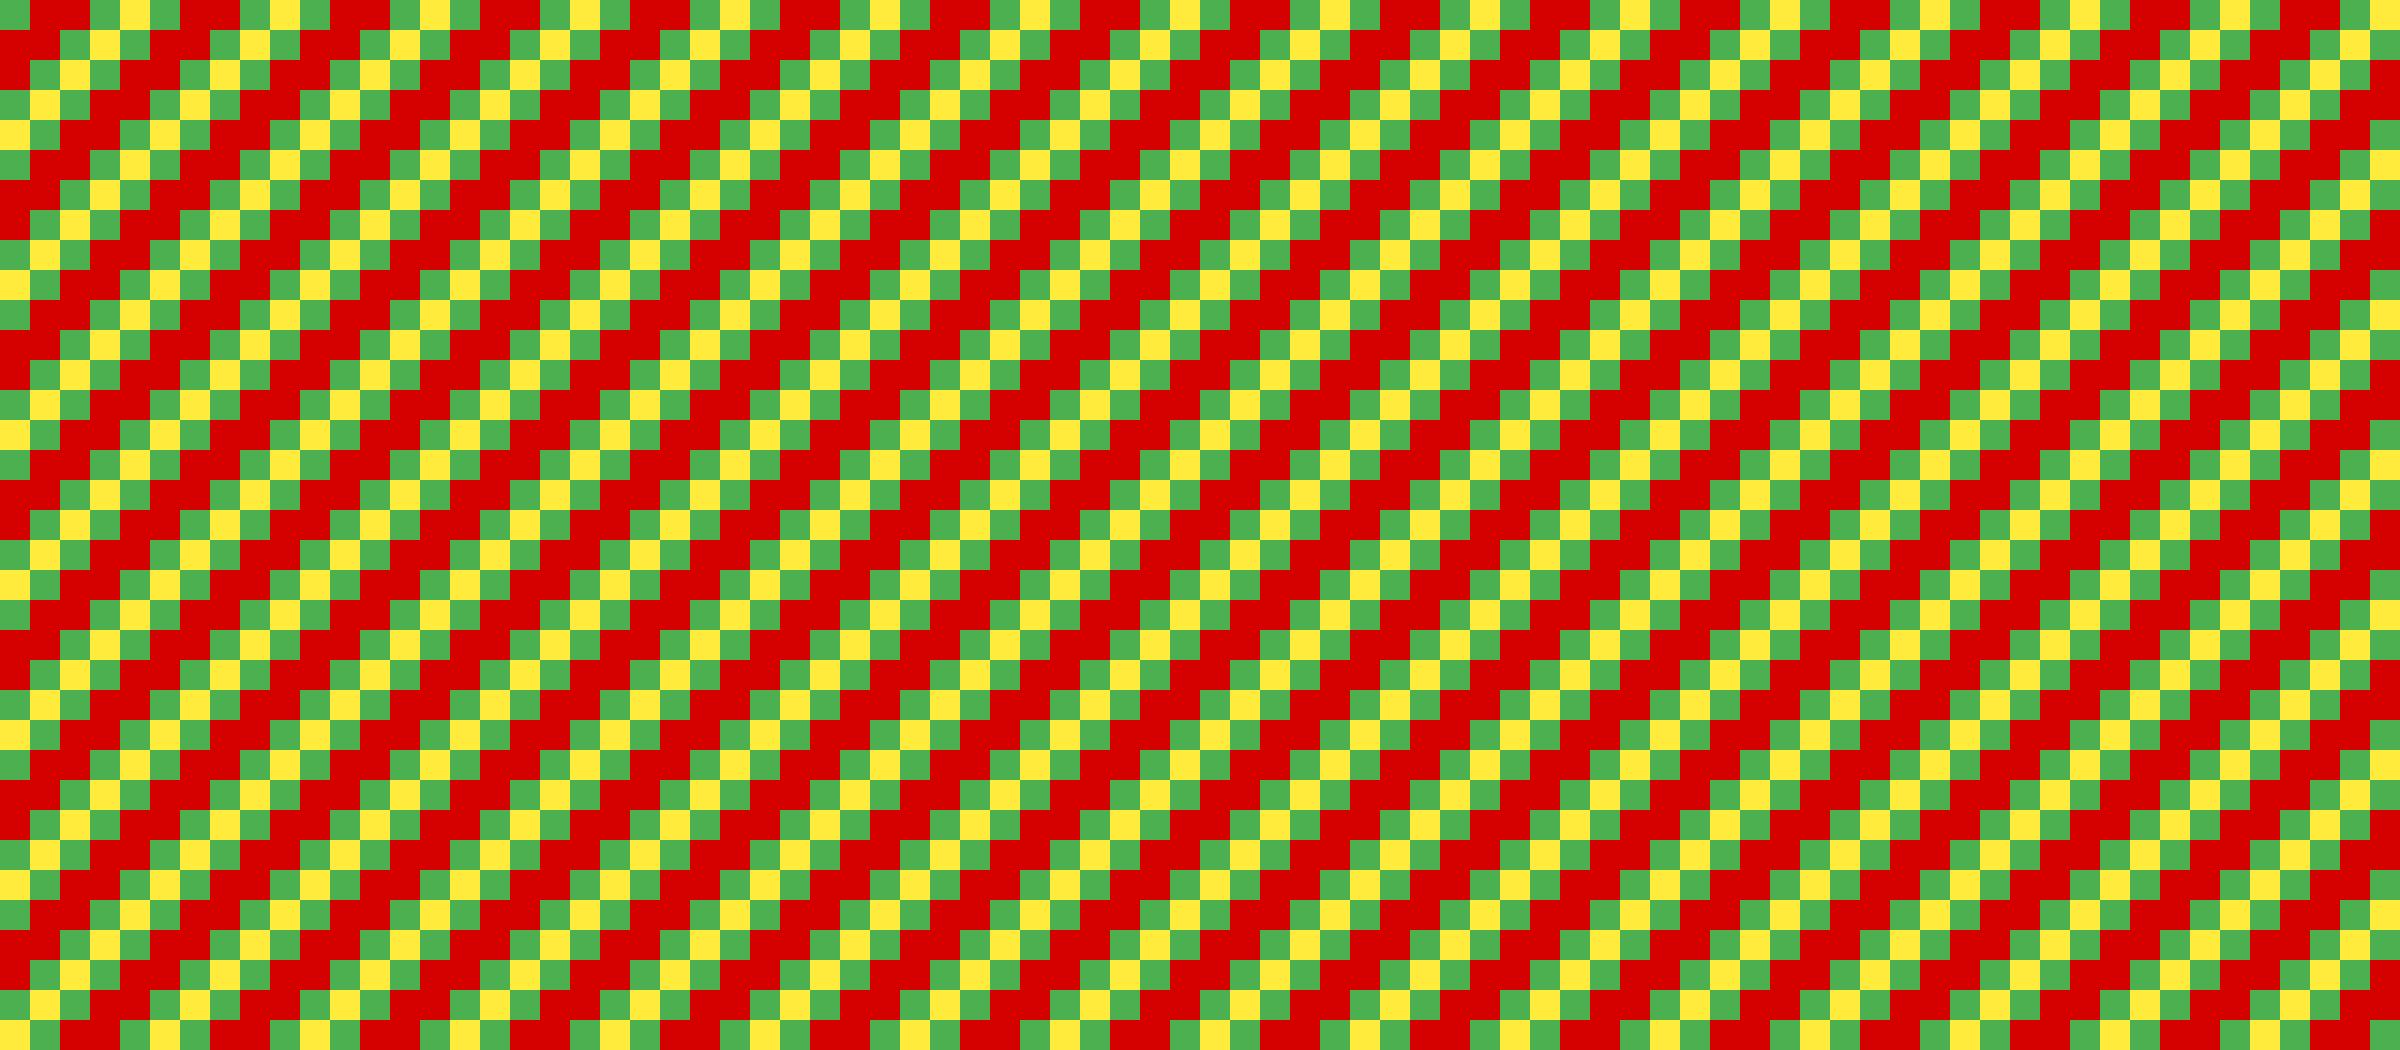 pixil-frame-0-2-1